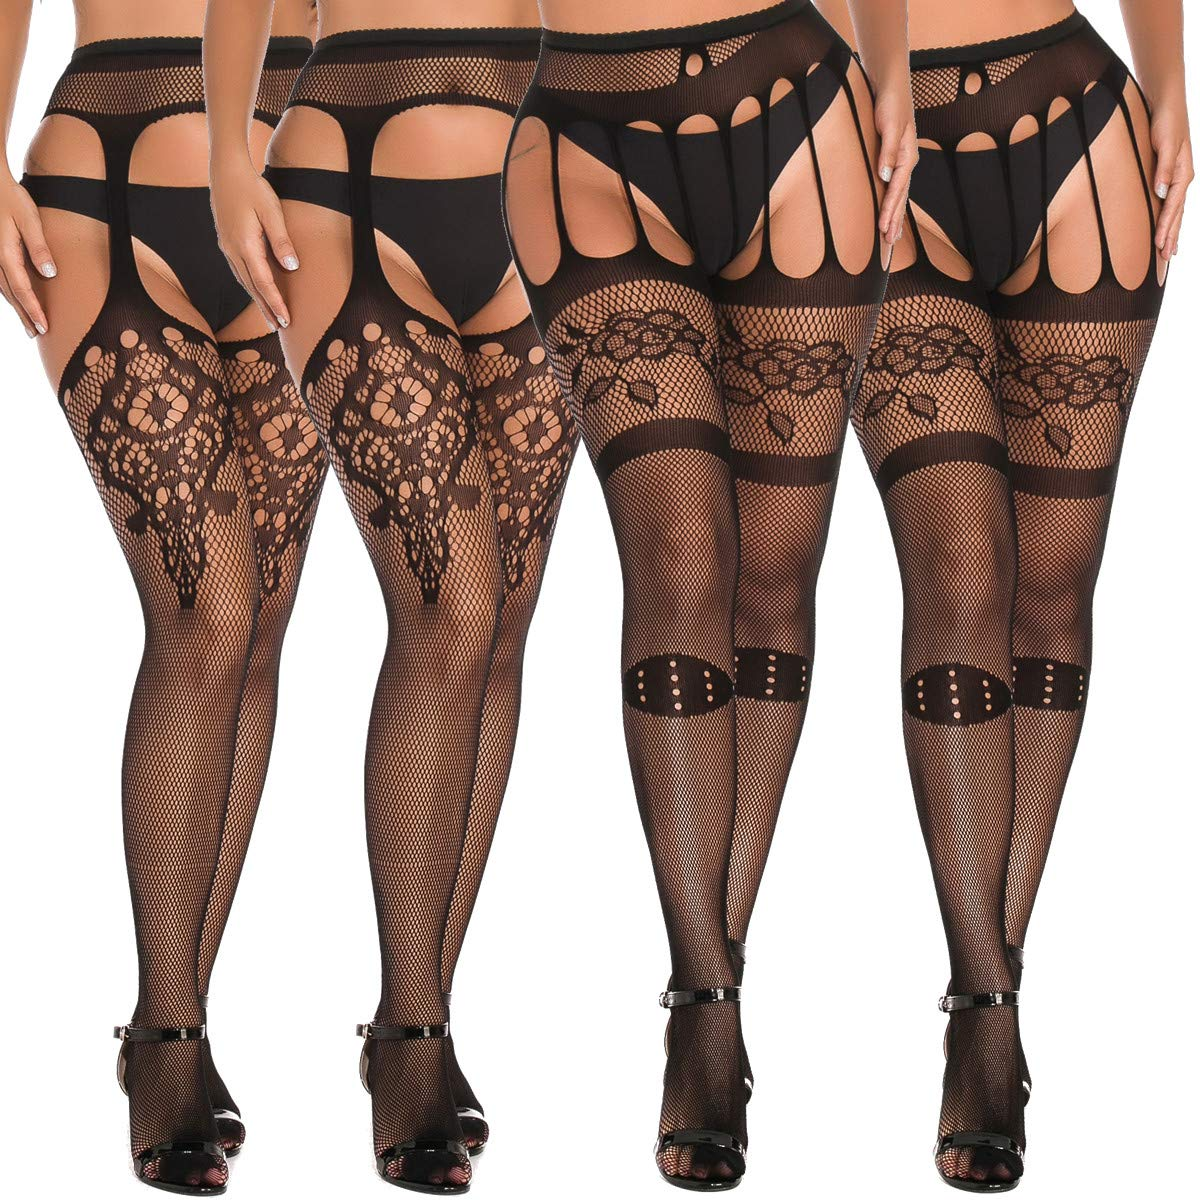 MengPa Fishnet Tights Suspender Stockings Thigh-High Pantyhose Black